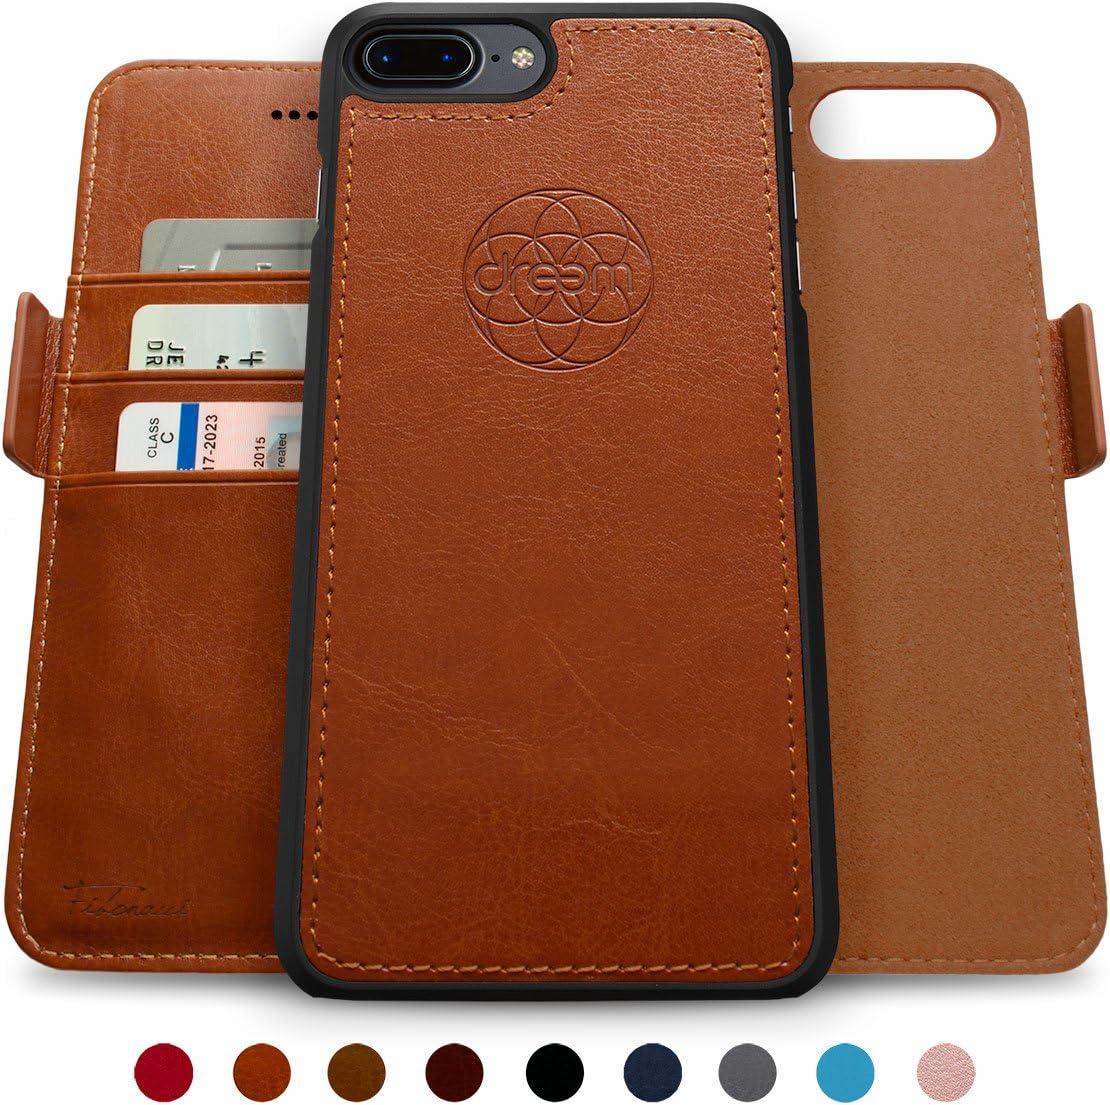 Dreem Fibonacci 2-in-1 Wallet-Case for iPhone 8-Plus & 7-Plus, Magnetic Detachable Shock-Proof TPU Slim-Case, RFID Protection, 2-Way Stand, Luxury Vegan Leather, GiftBox - Caramel